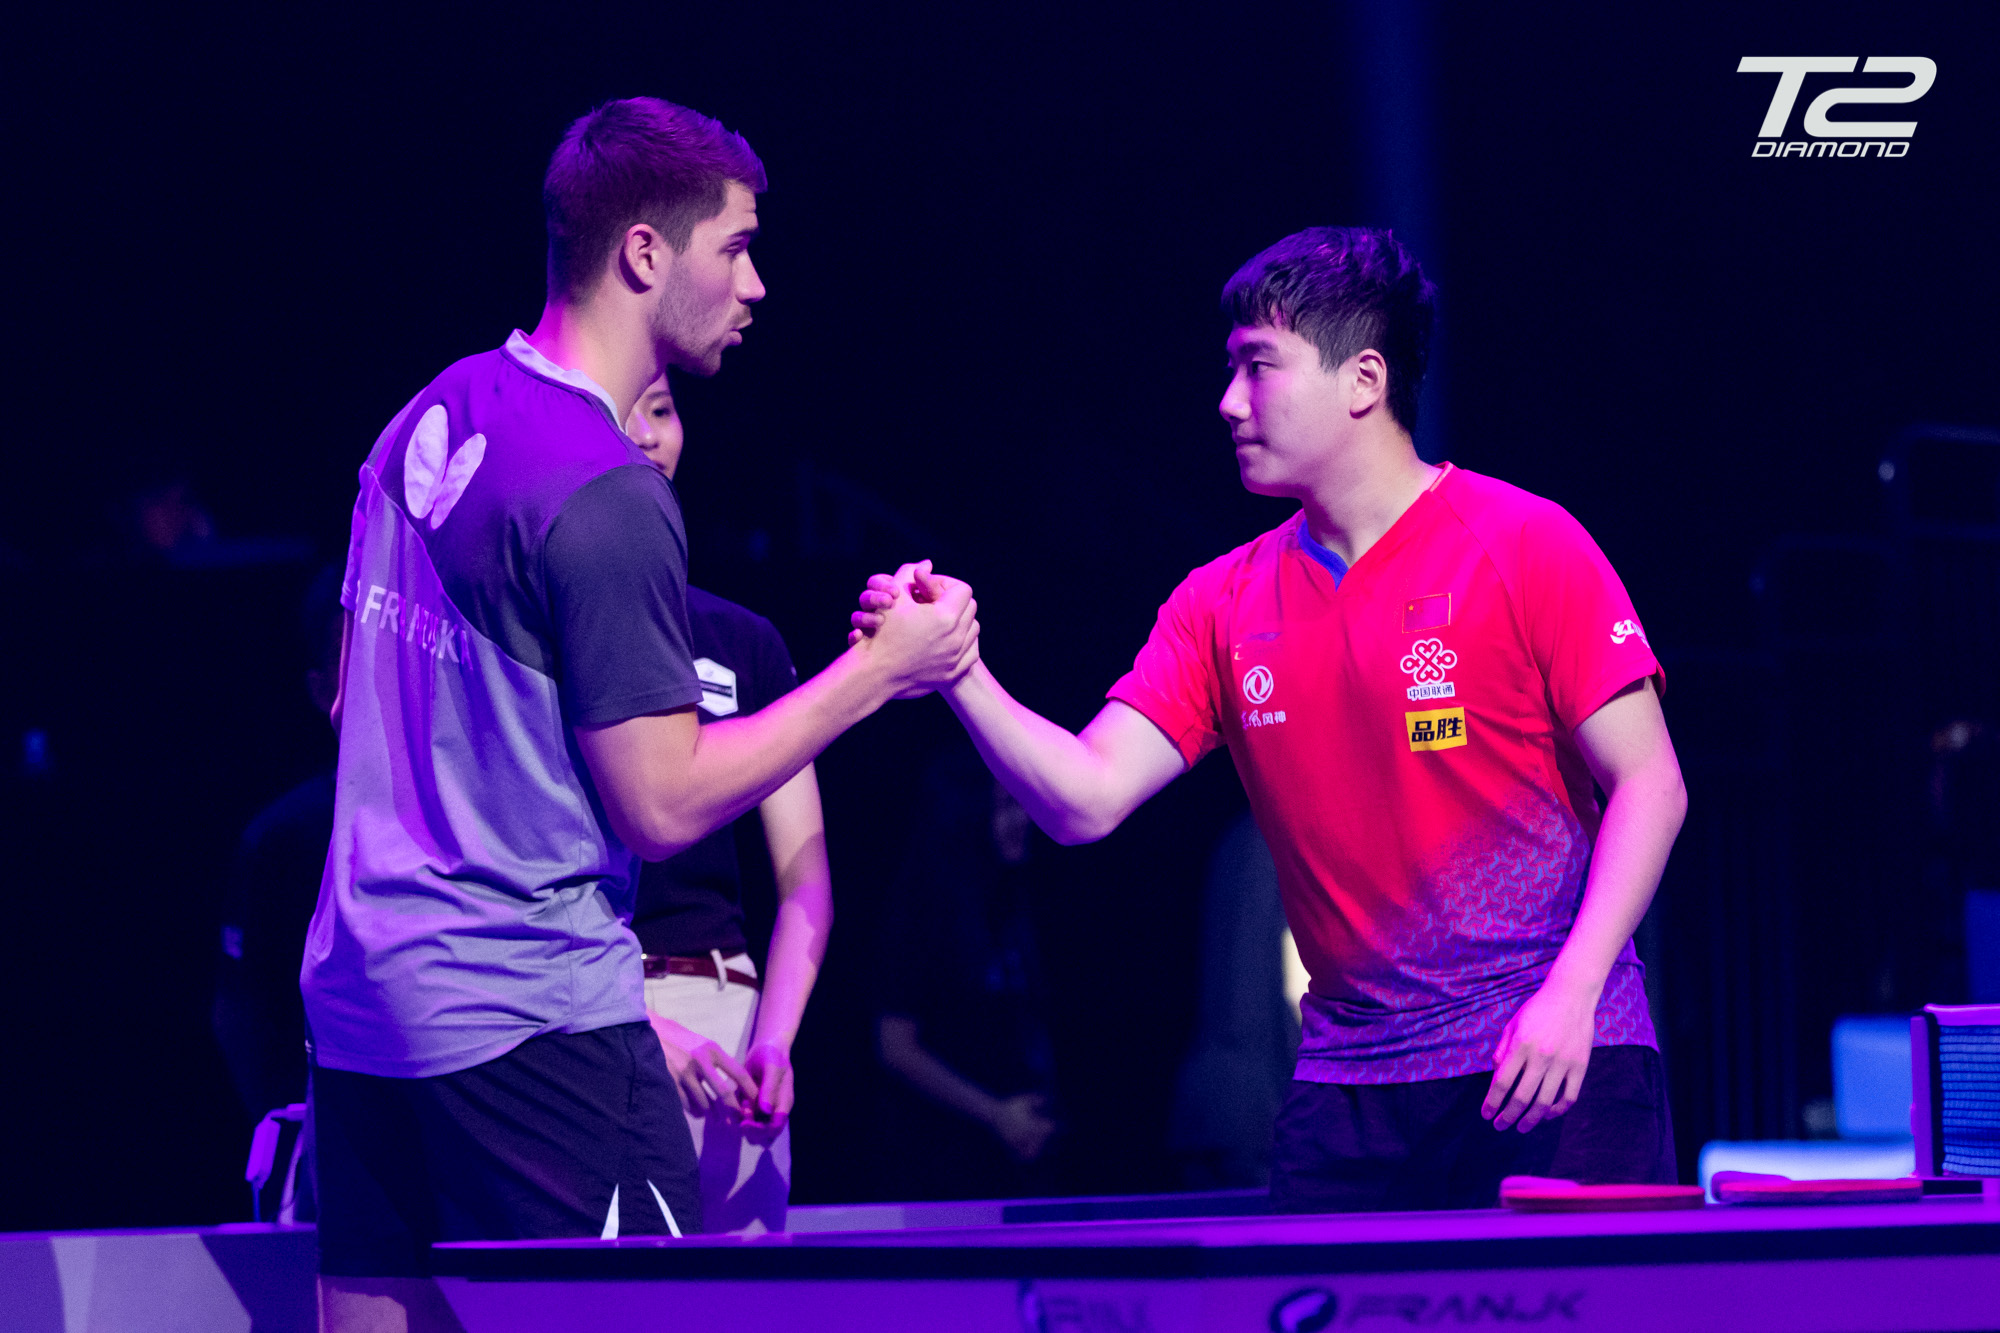 20190719_Match15_R16_LIANGjingkun_vs_FRANZISKApatrick_00049_WEBRES